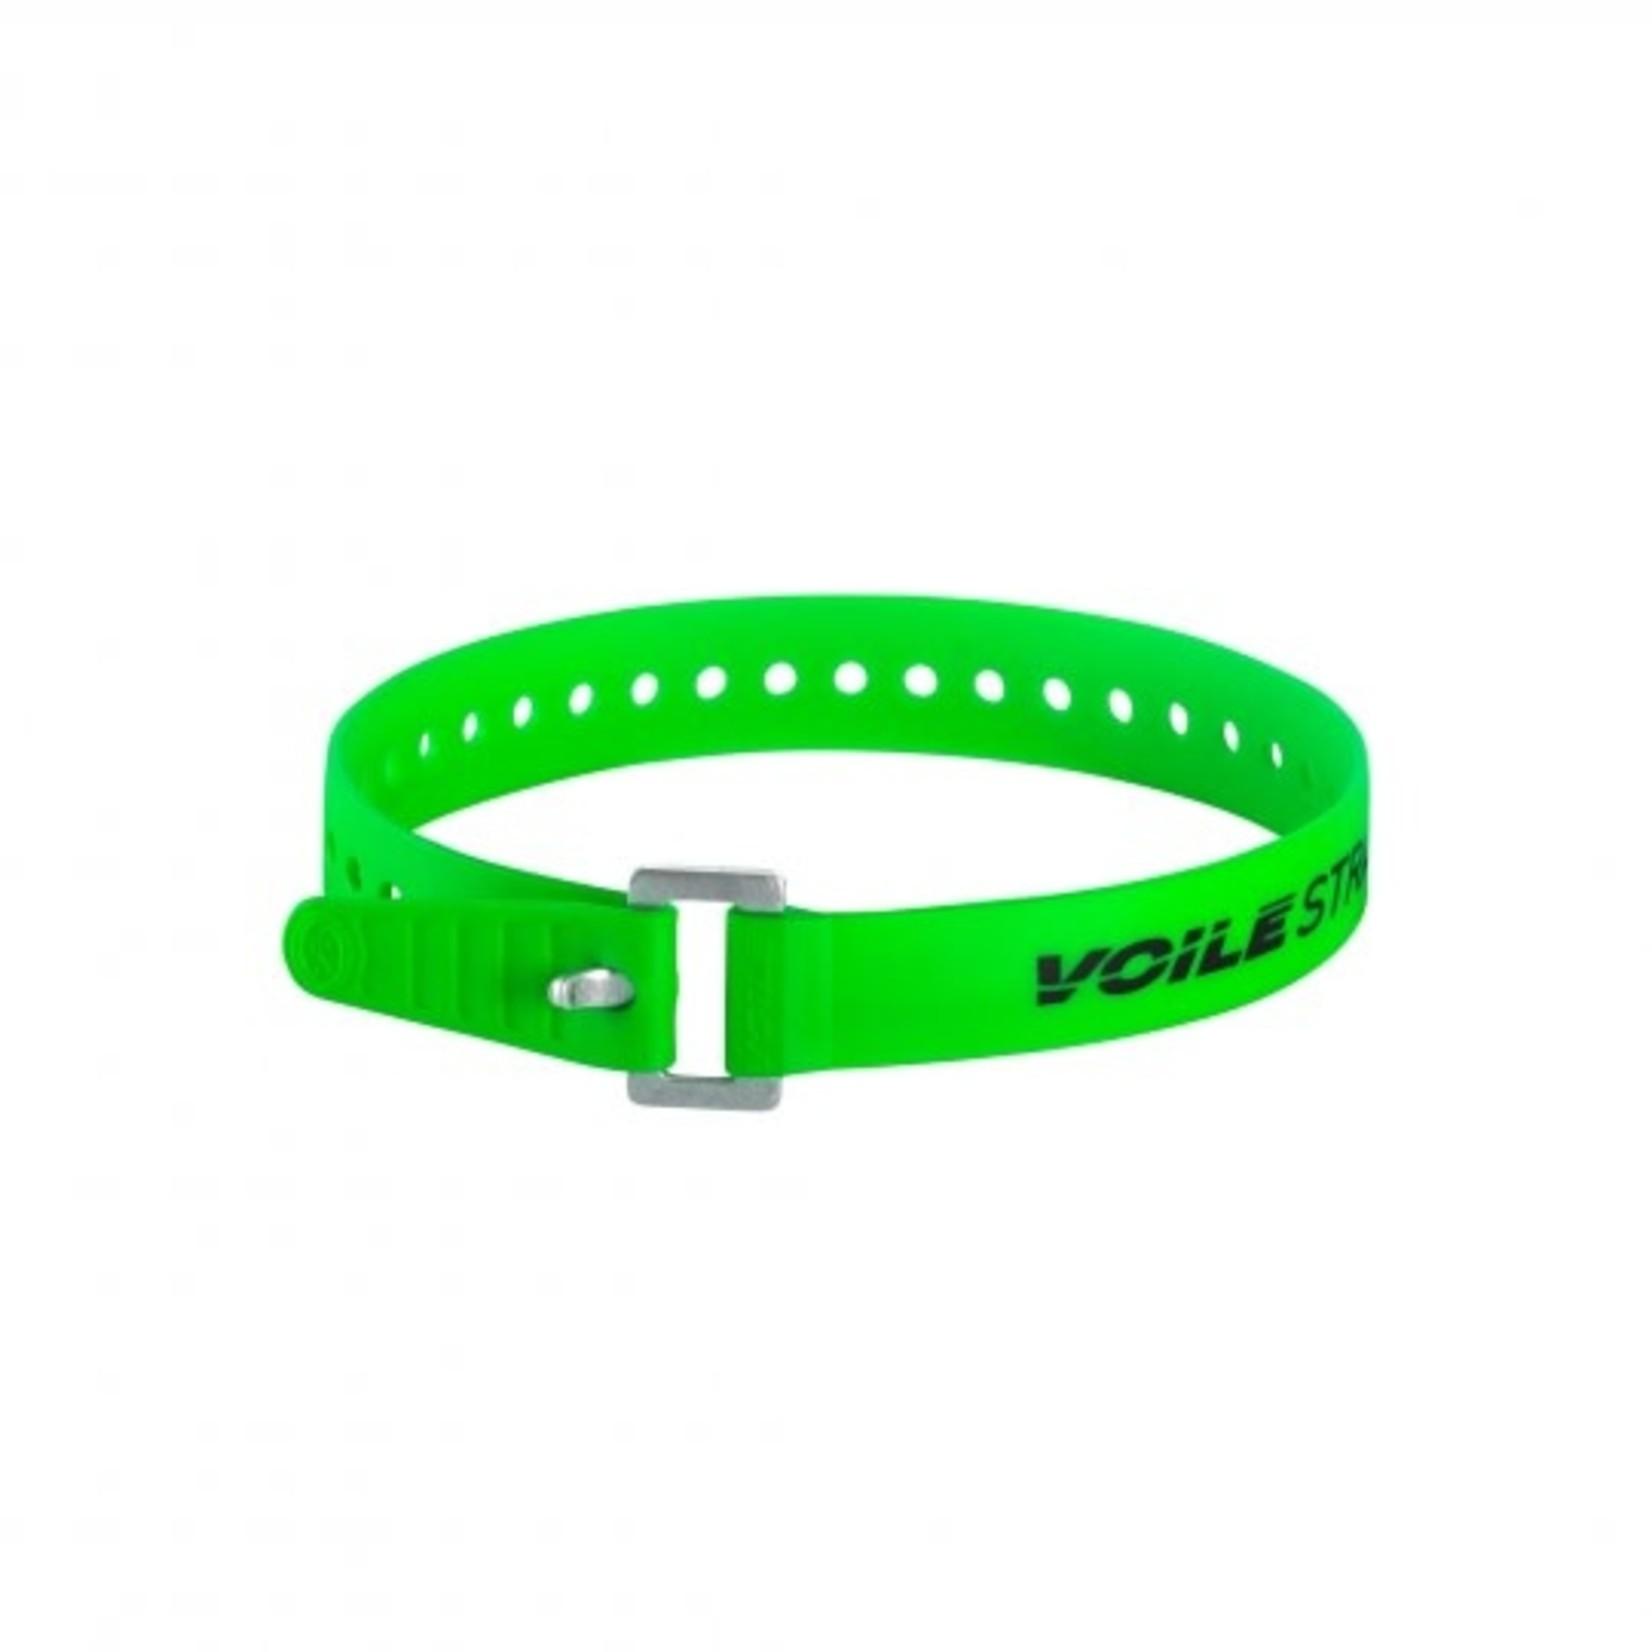 Voile Straps XL Series